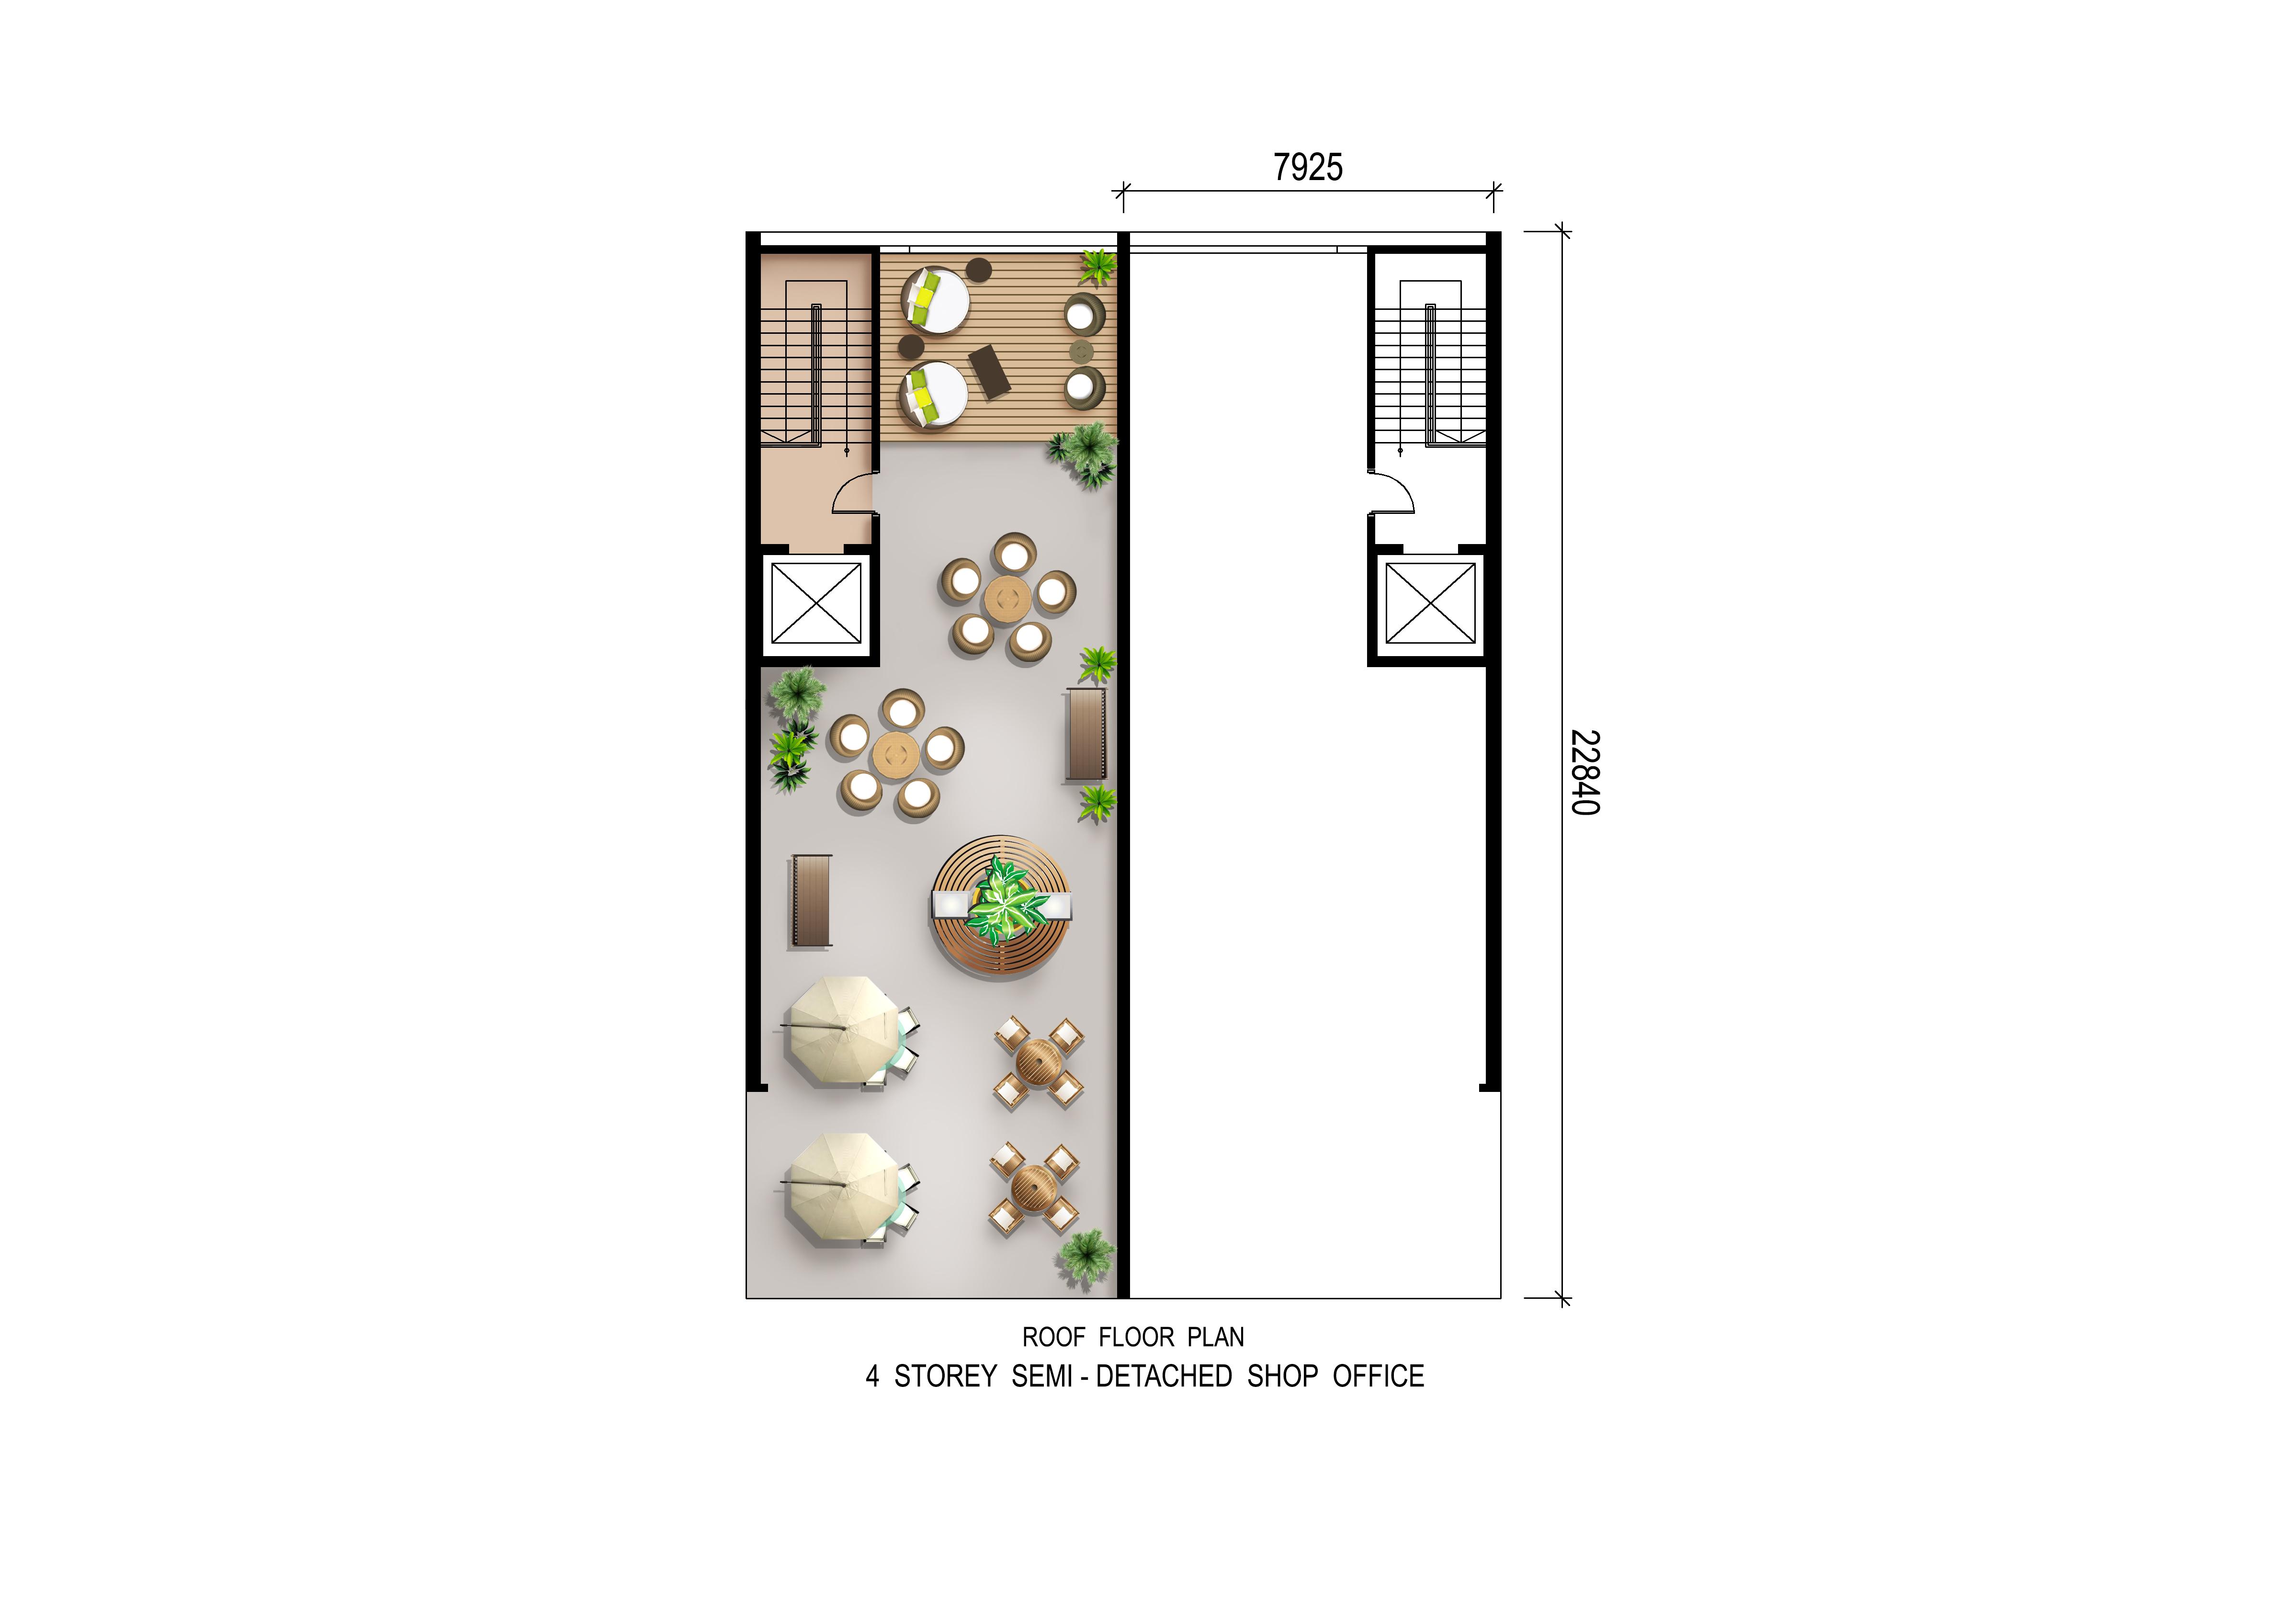 4 Storey Semi D Shop Office (Roof Plan)